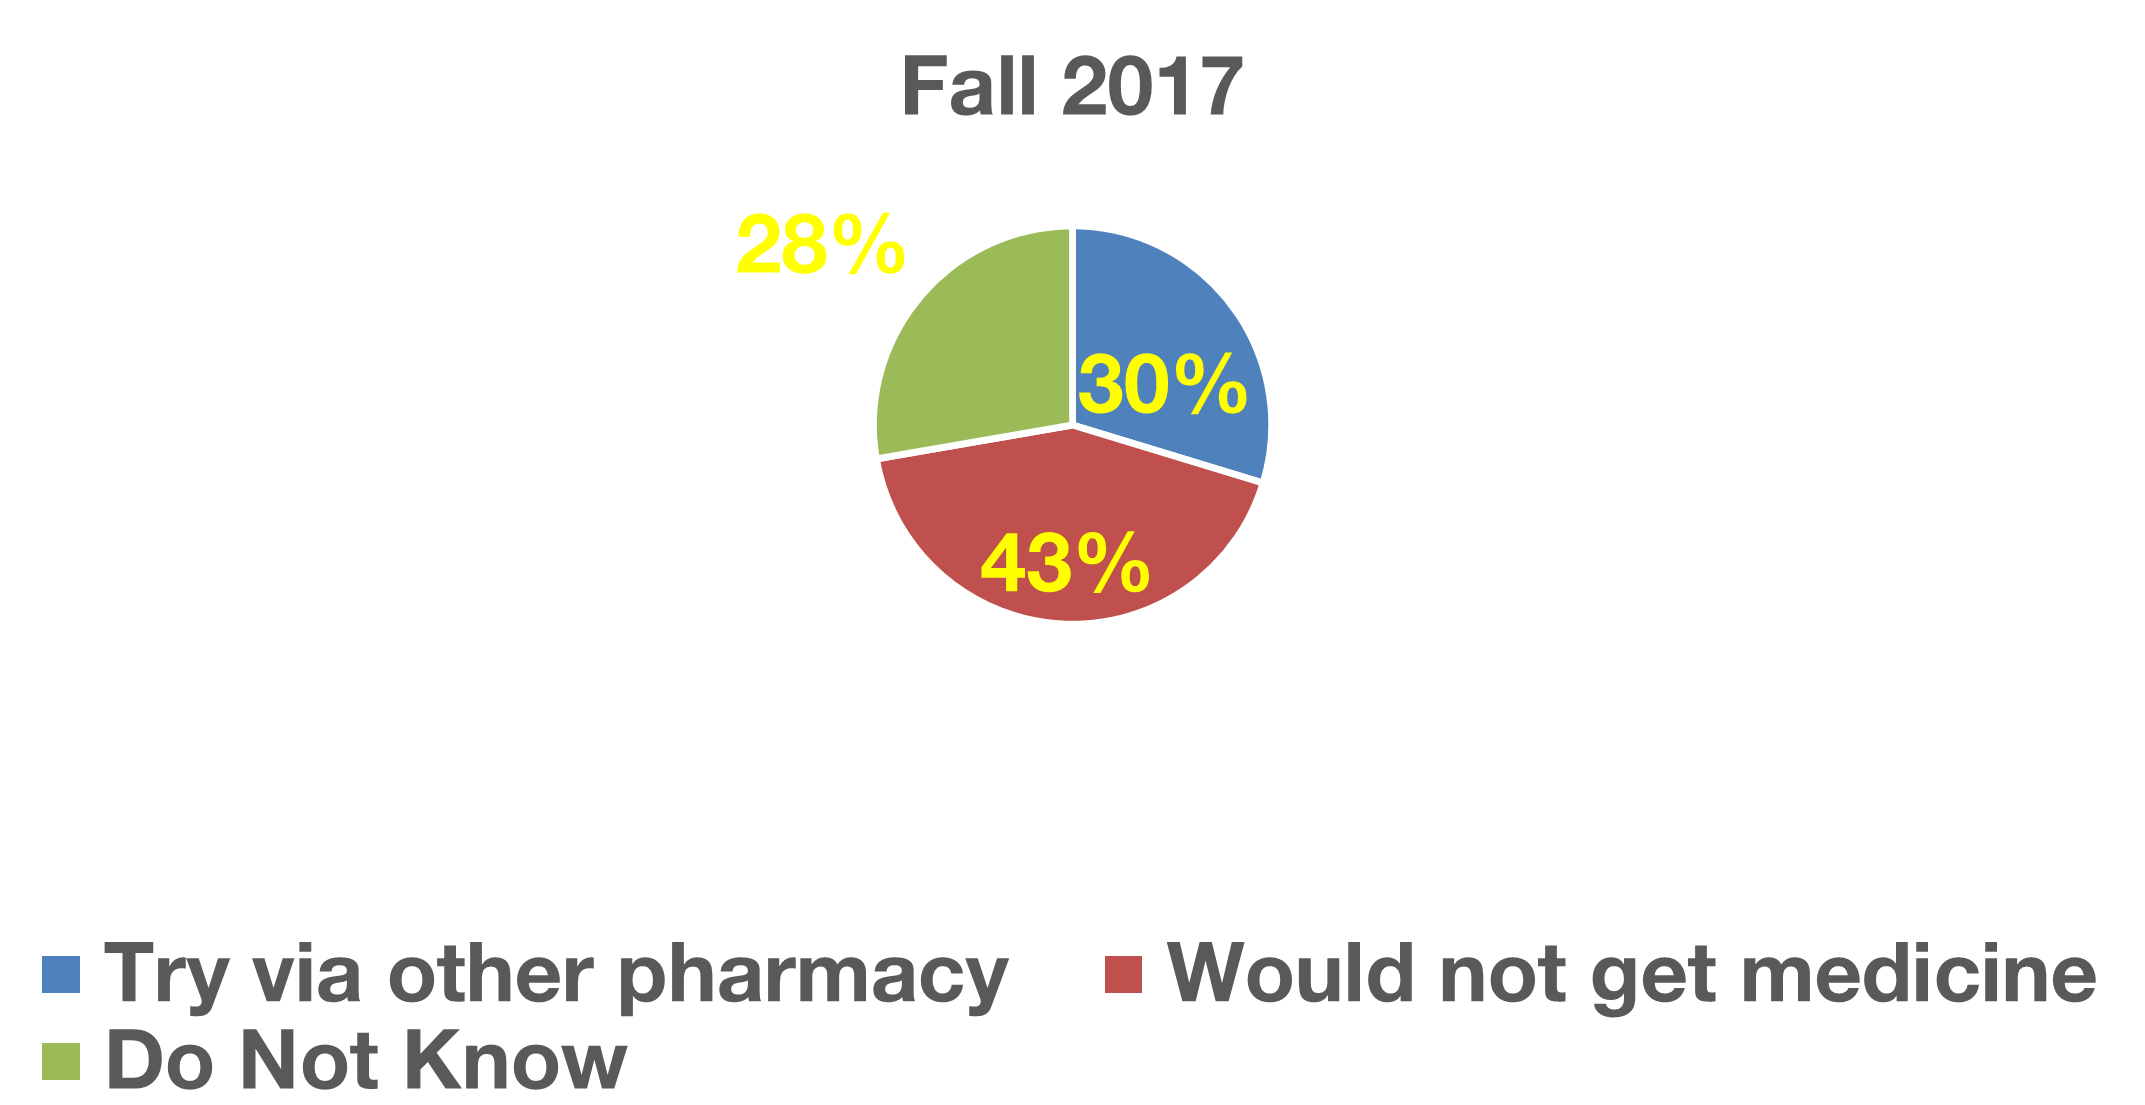 pharmacy patient medication access survey